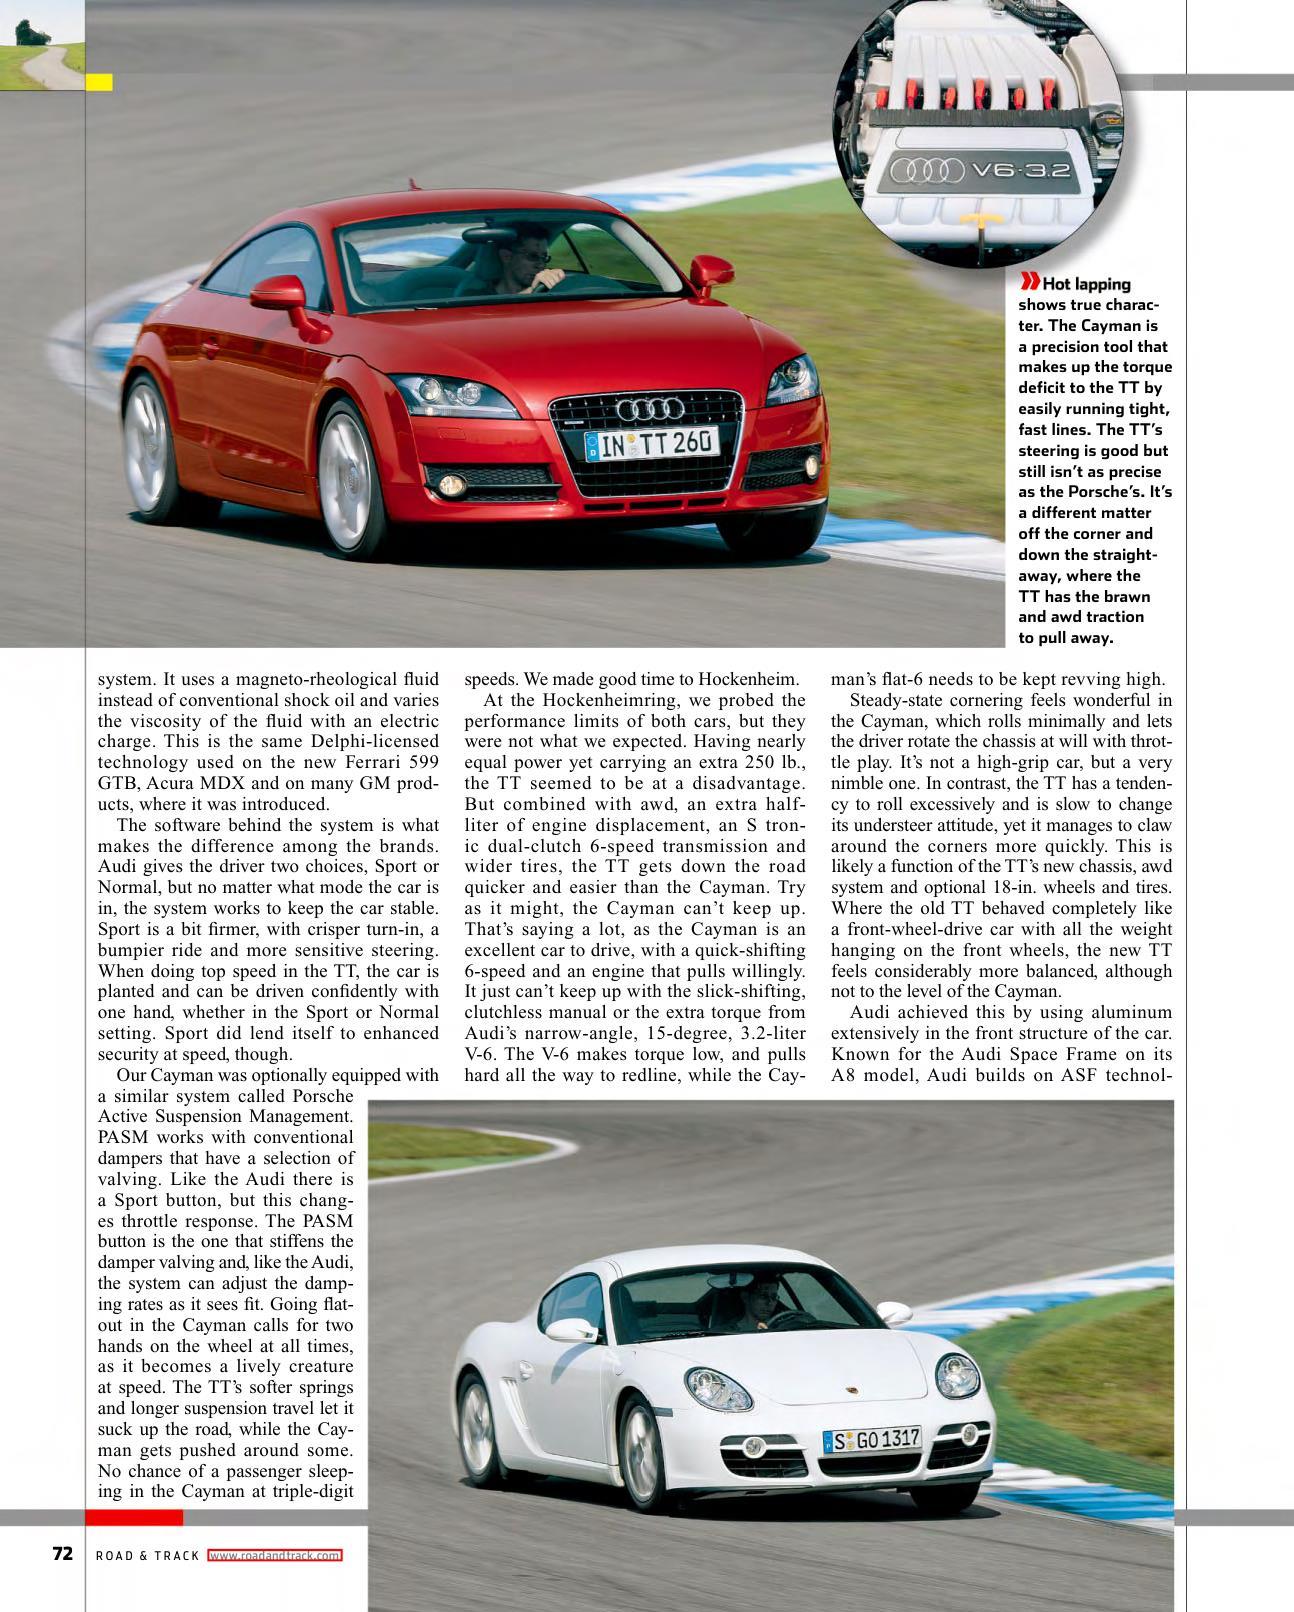 Porsche 987 Cayman Vs Audi TT 3.2 Quattro (Road & Track